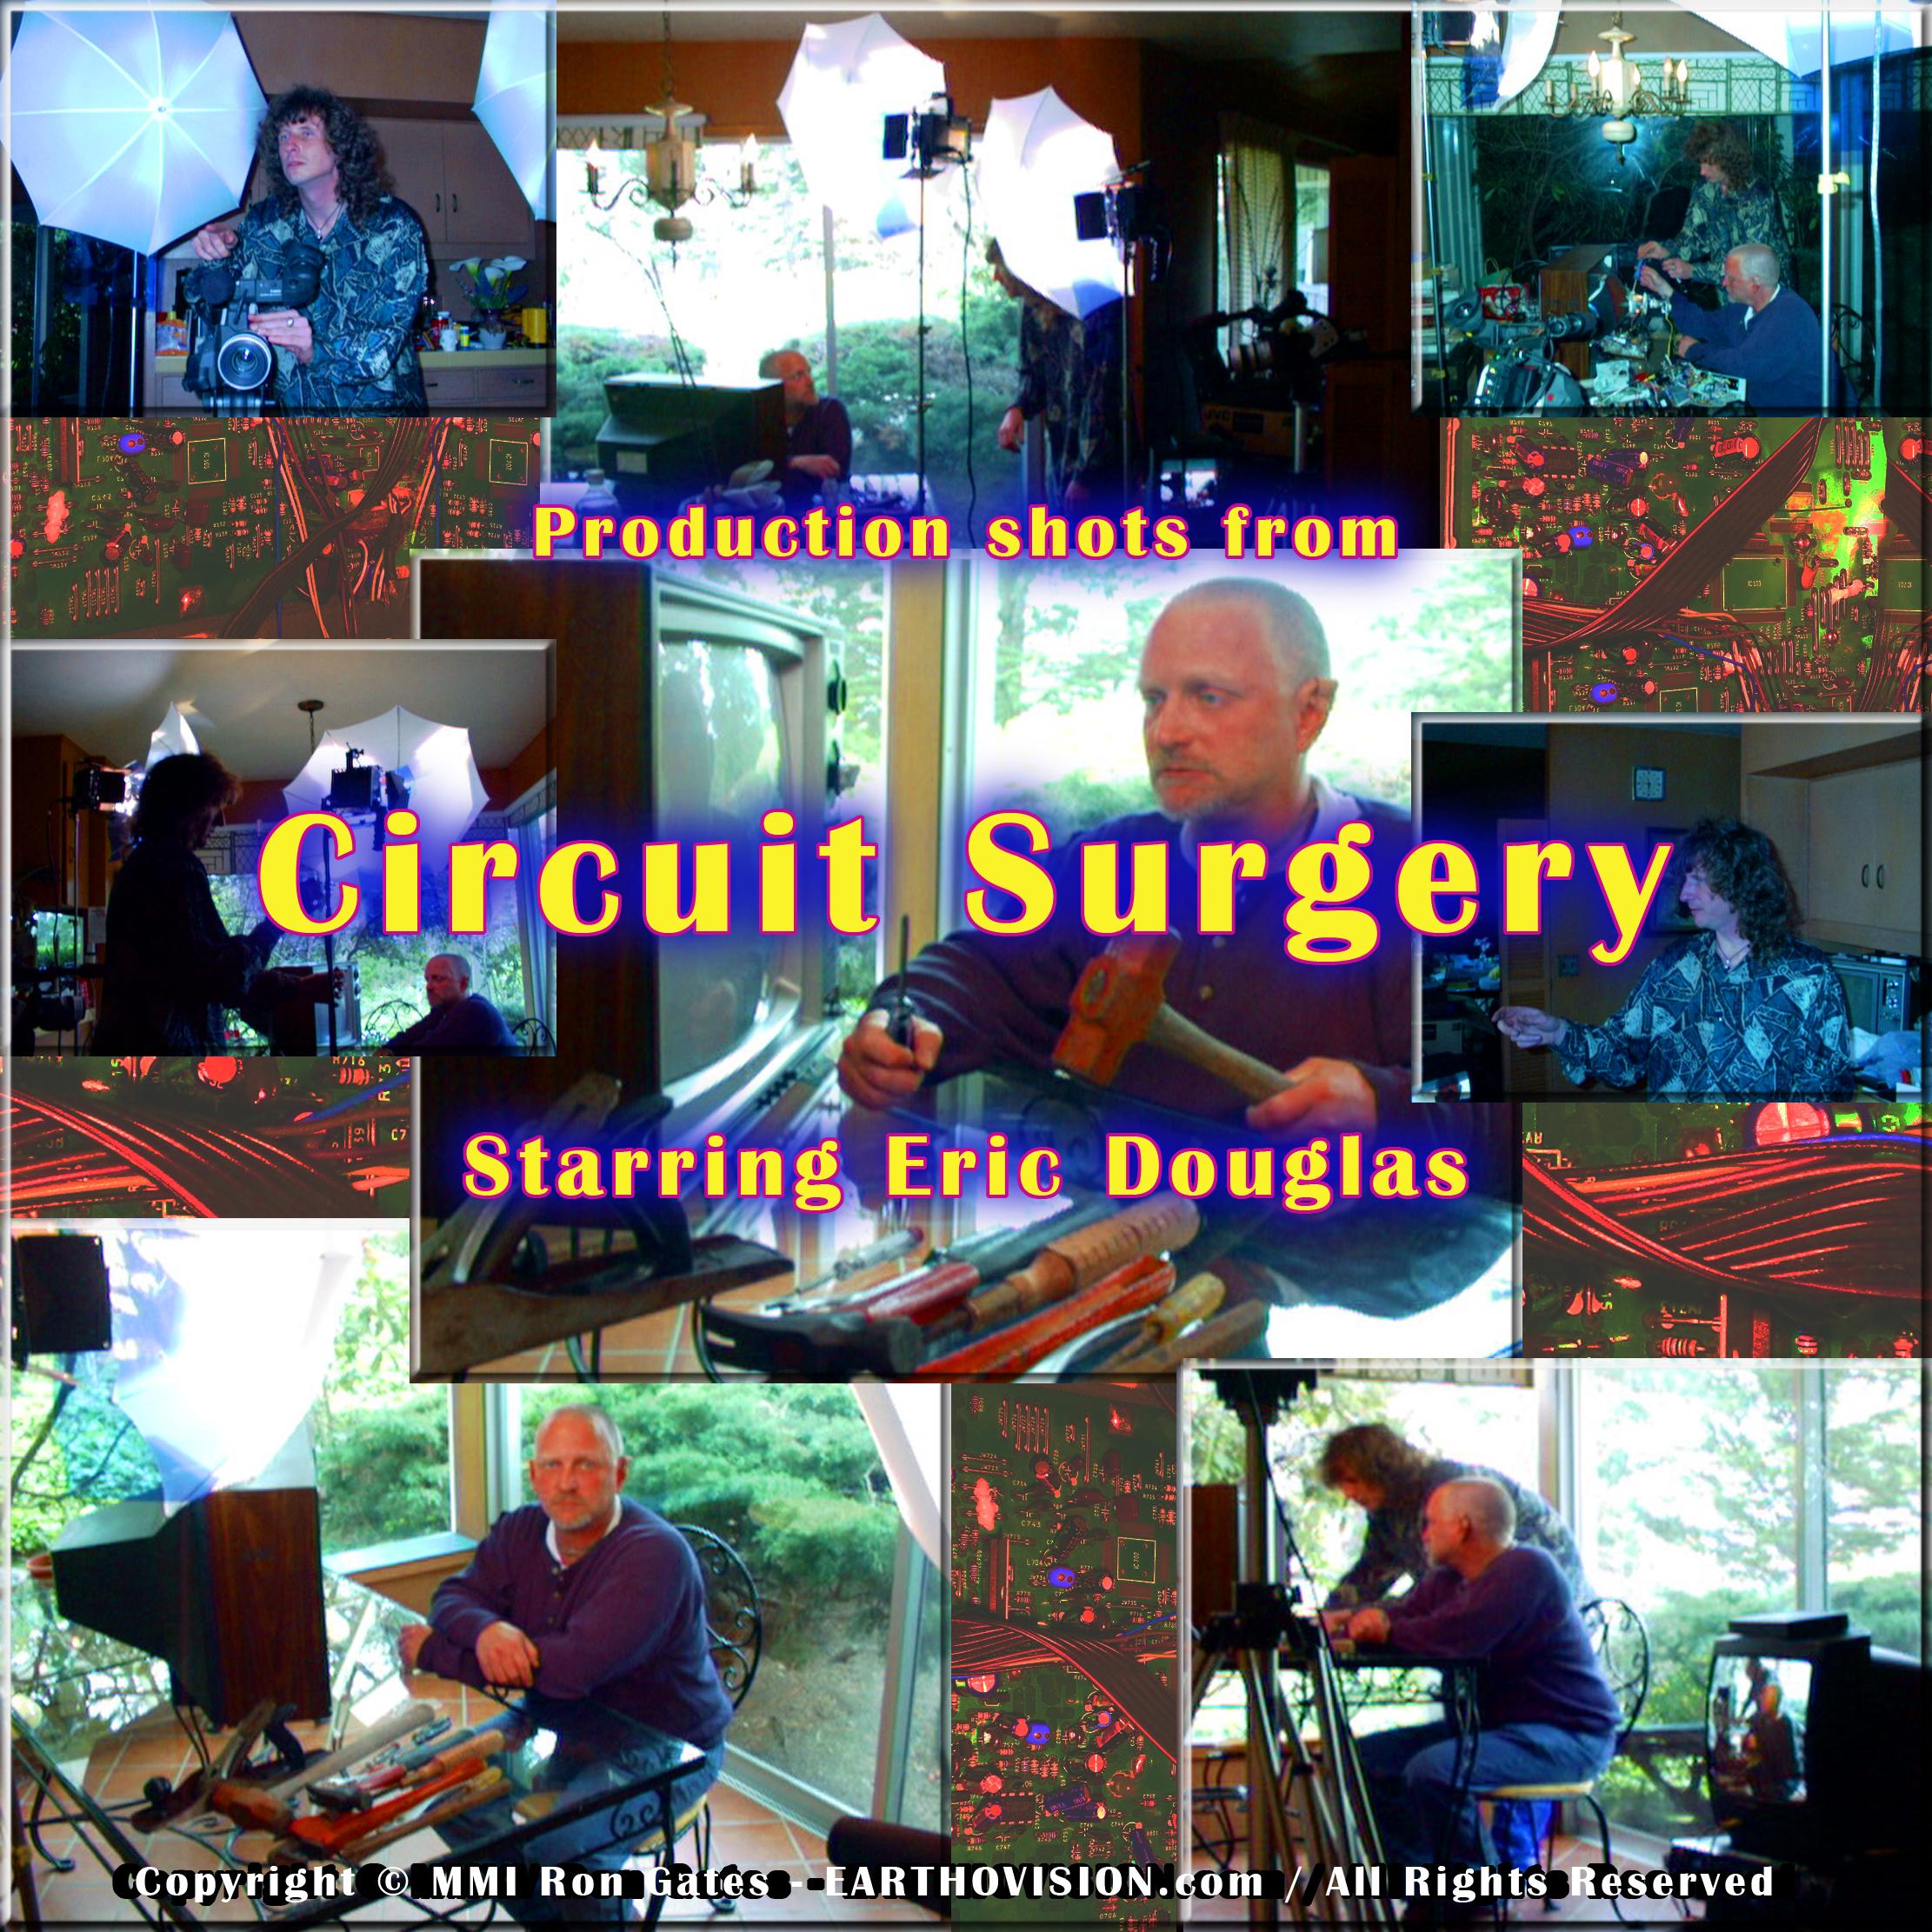 CircuitSurgery